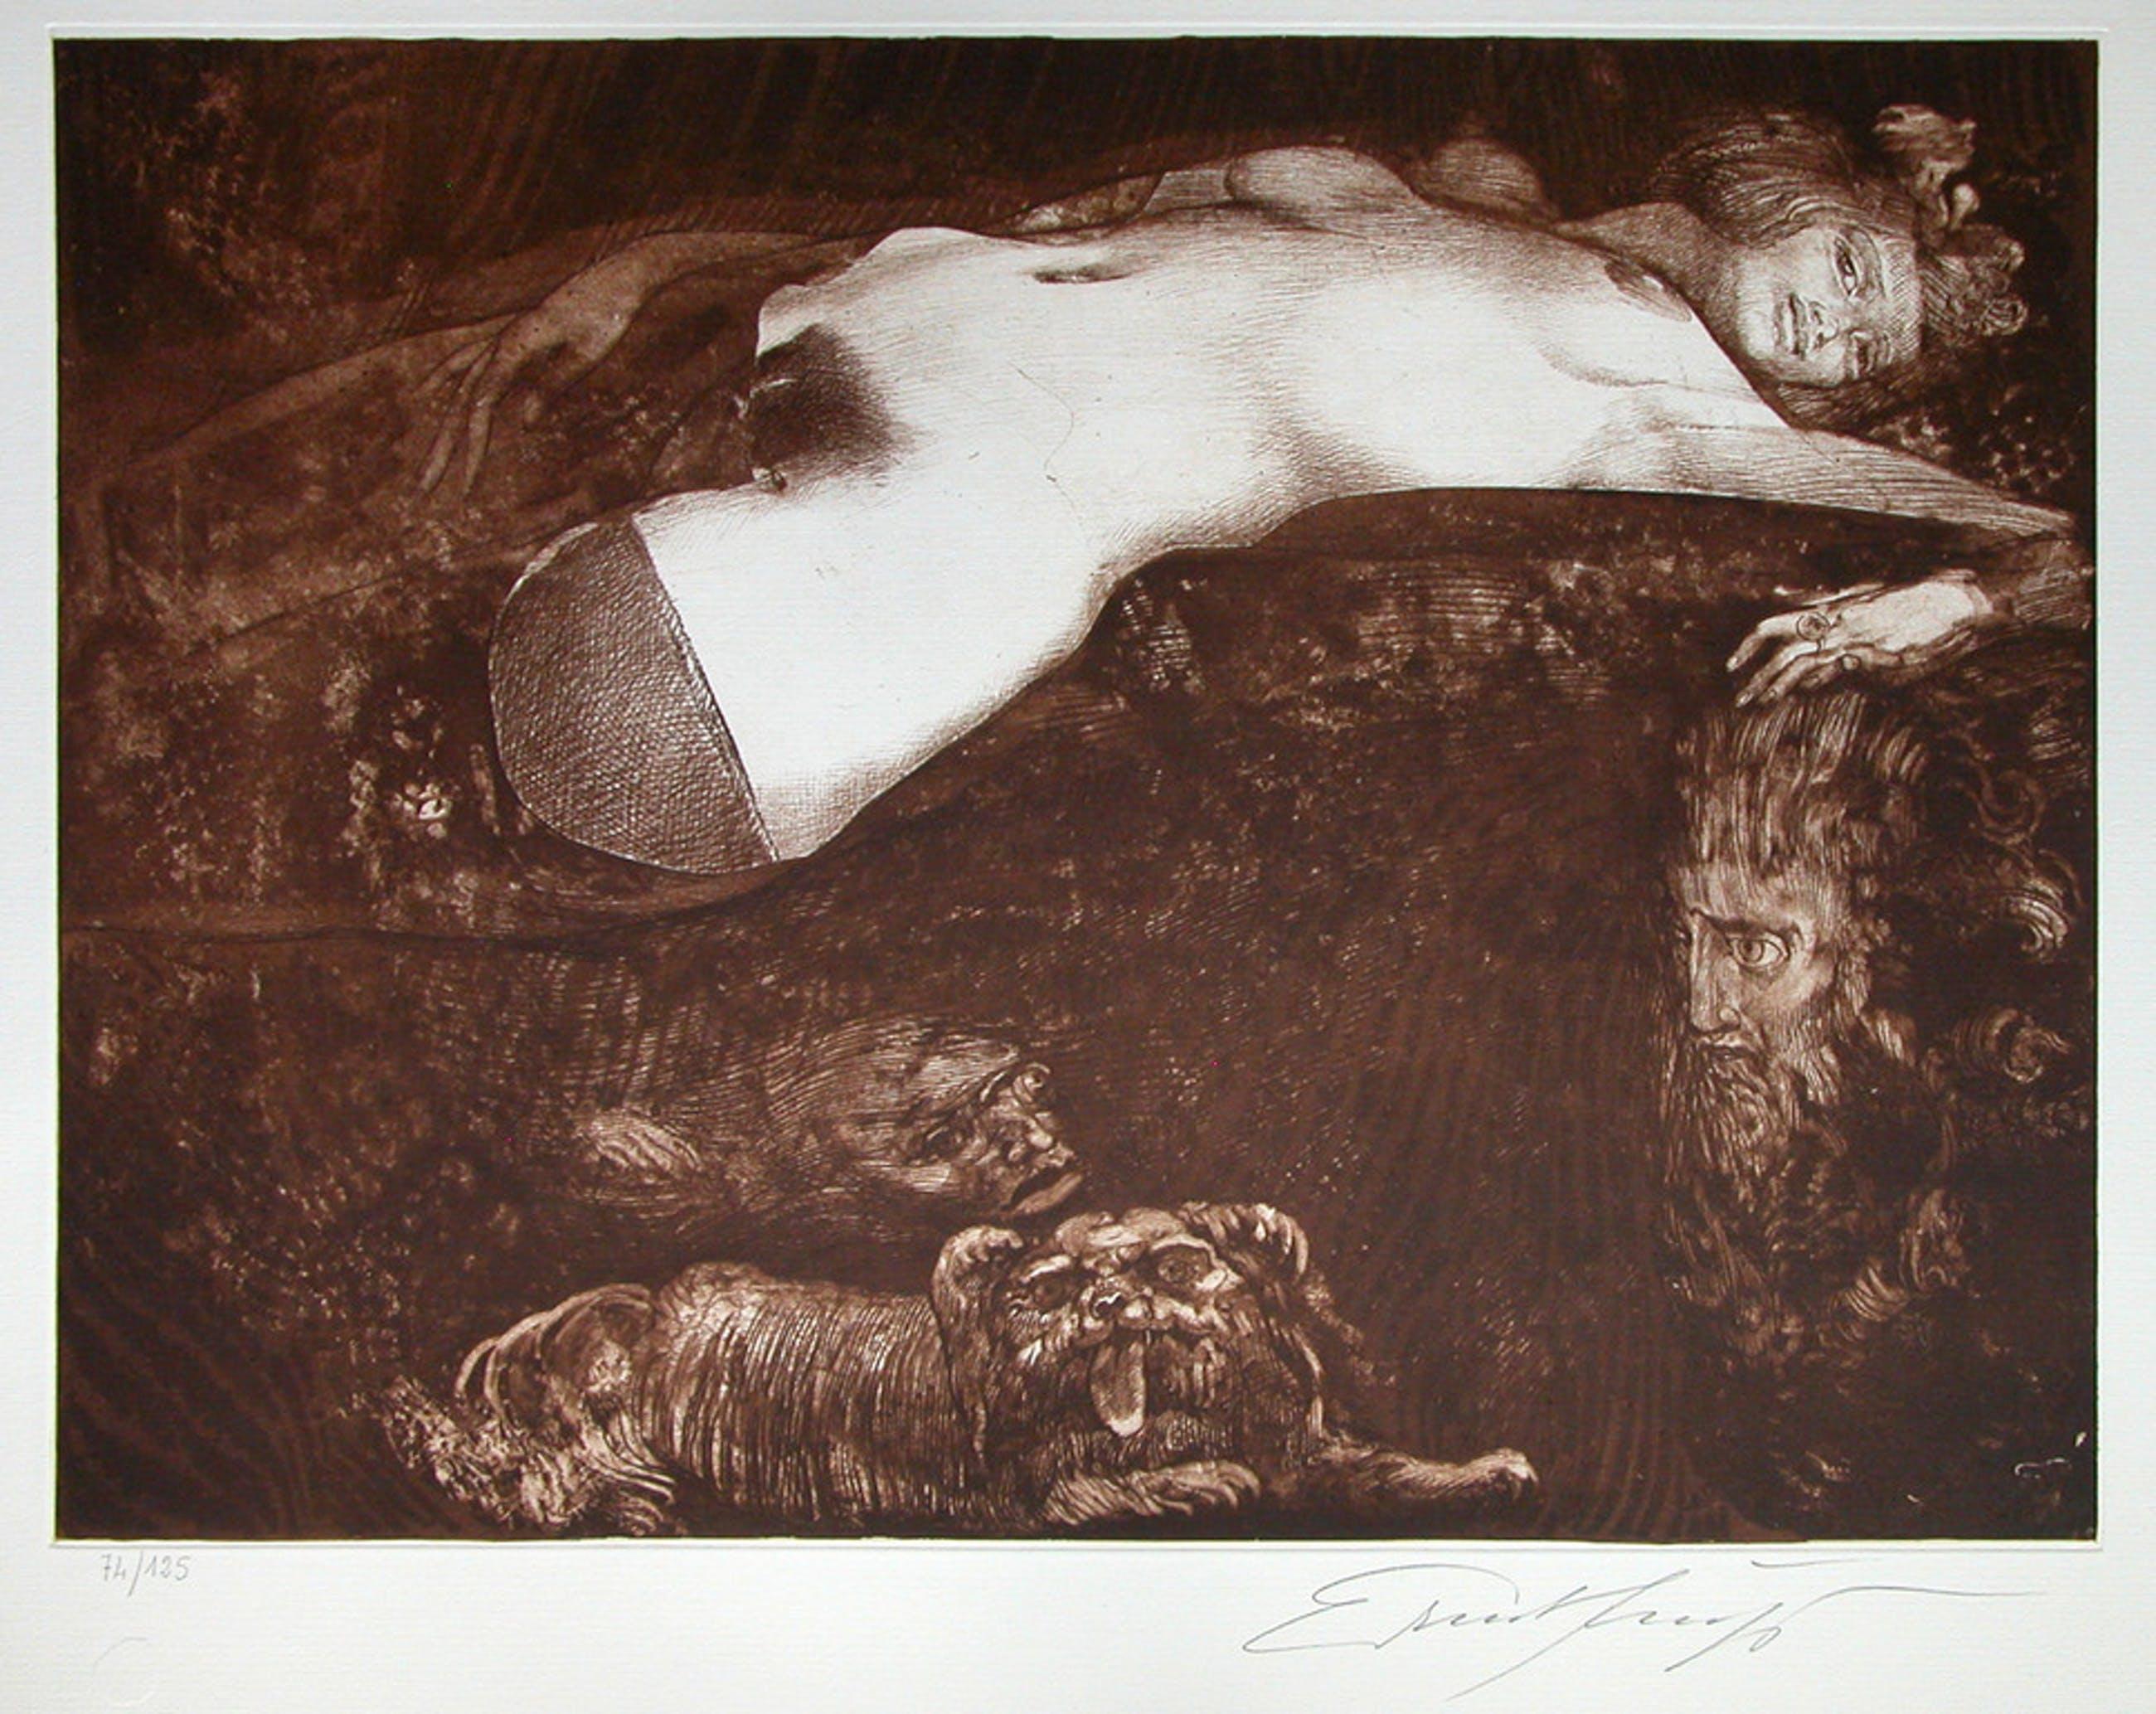 Ernst Fuchs, 'Salome', originele ets/aquatint, handgesigneerd, 1991, ed. 125  kopen? Bied vanaf 175!